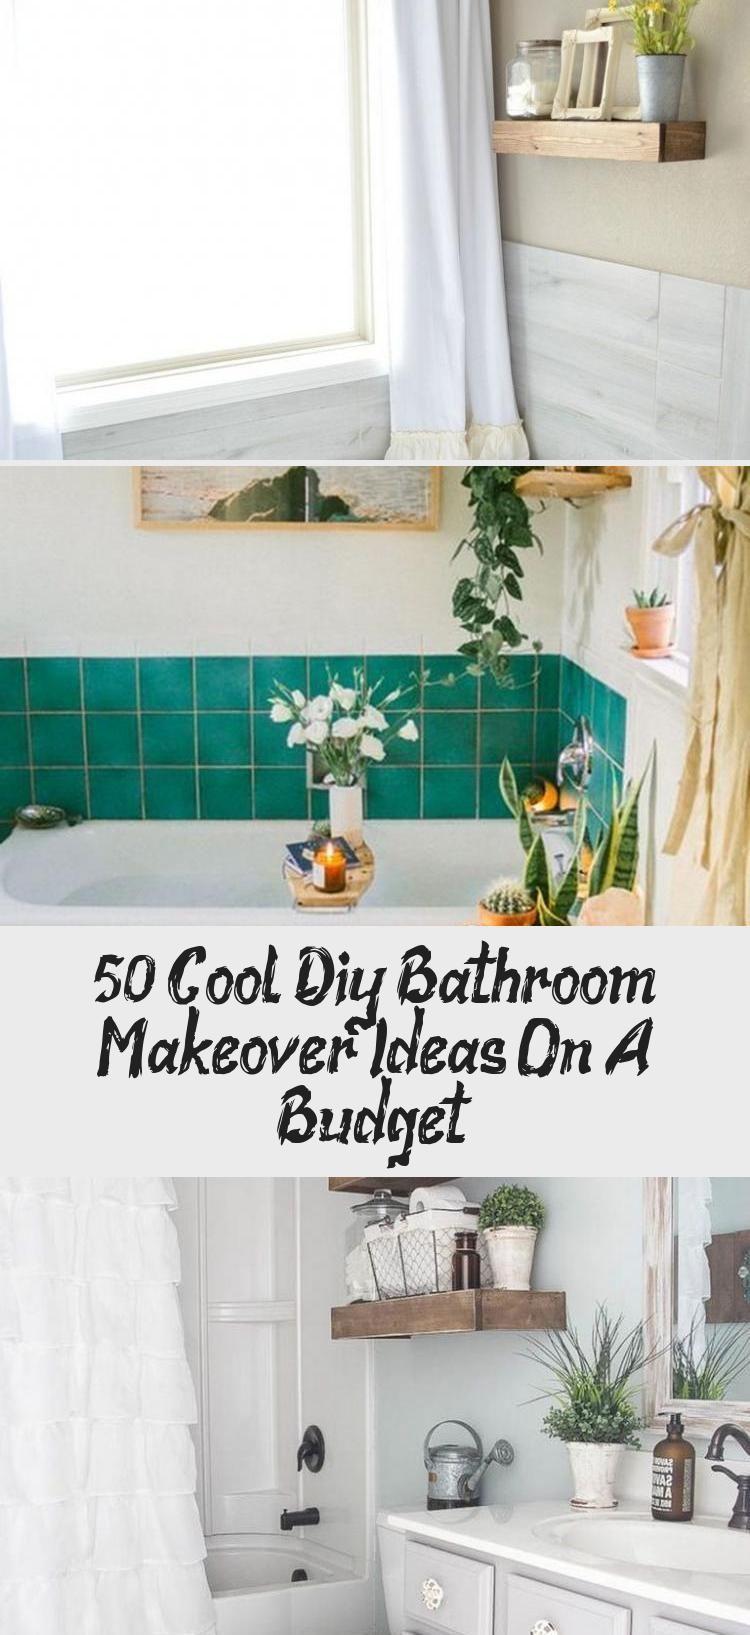 50 Coole Diy Badezimmer Makeover Ideen Mit Kleinem Budget Badezimmer Bathroomrenovationfarmhouse Bat In 2020 Diy Bathroom Makeover Bathroom Makeover Diy Bathroom